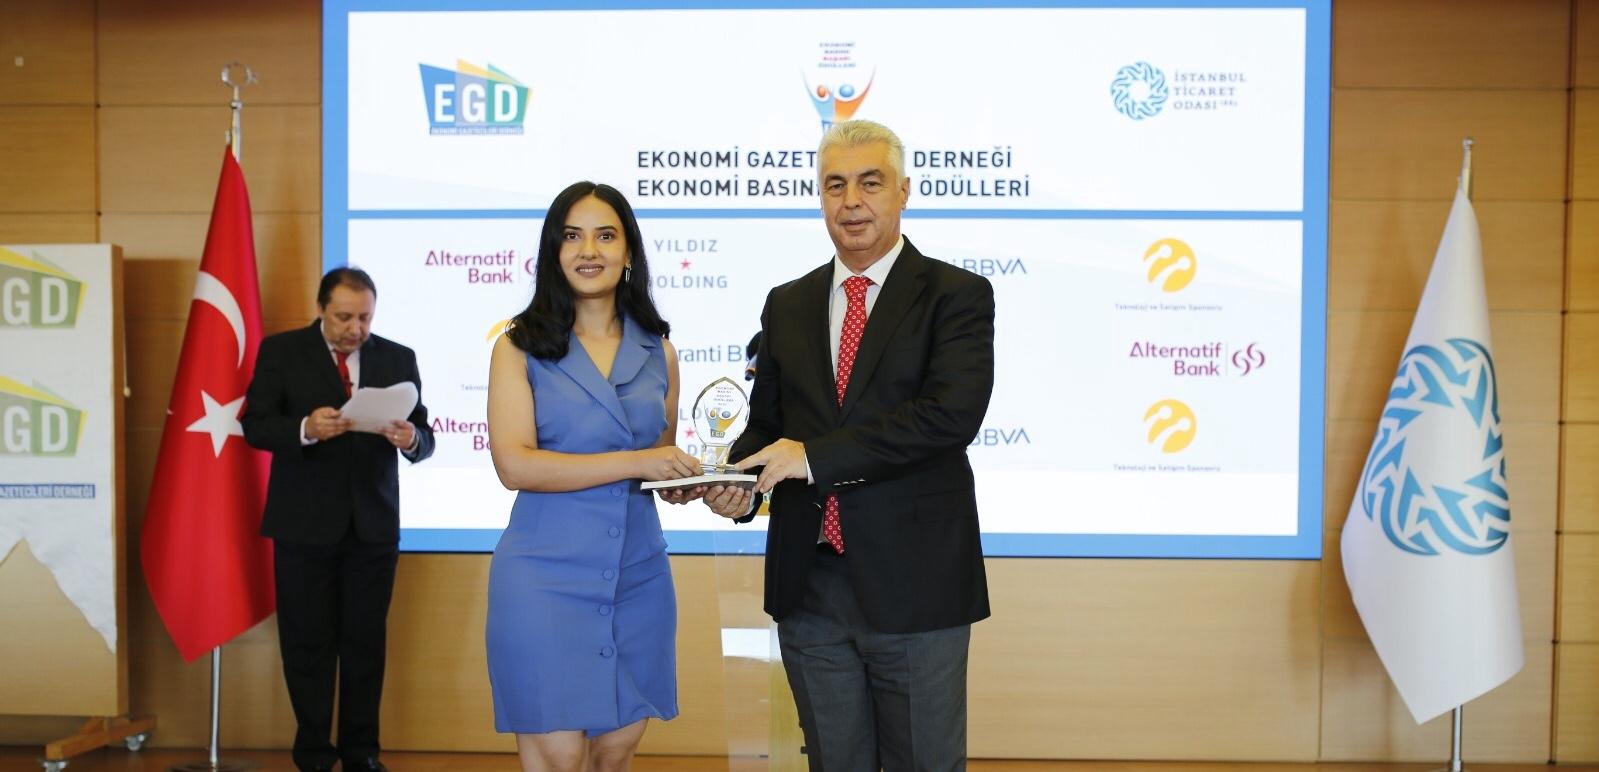 EGD'den ödül aldık